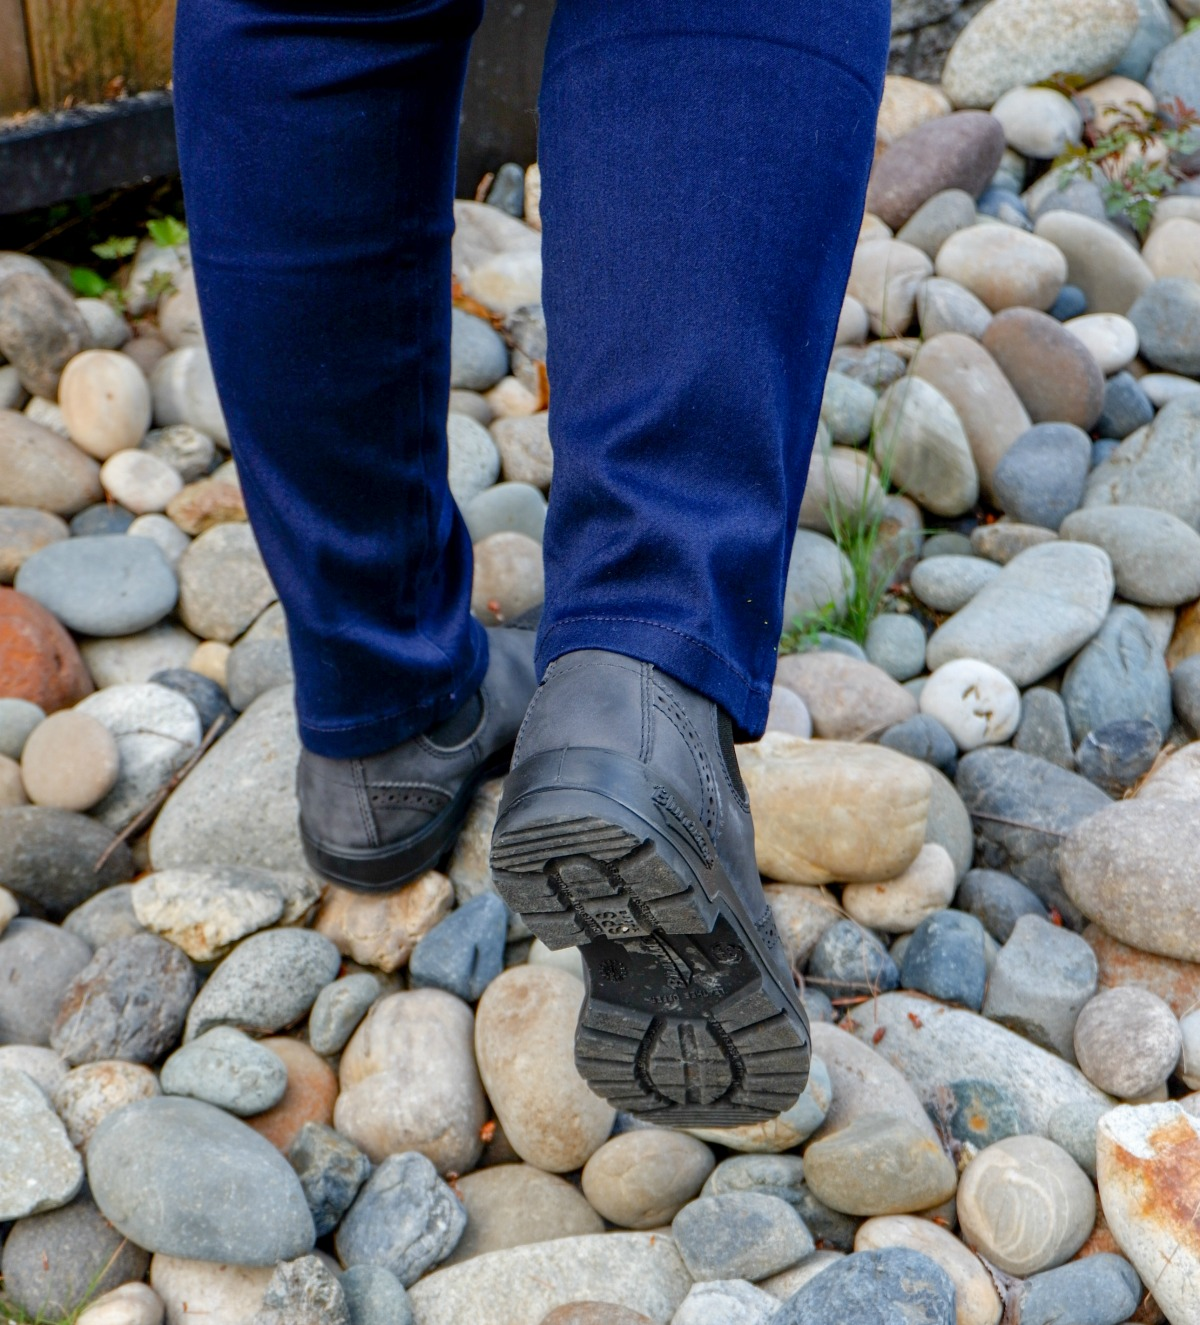 Blundstone men, kids and women's boots